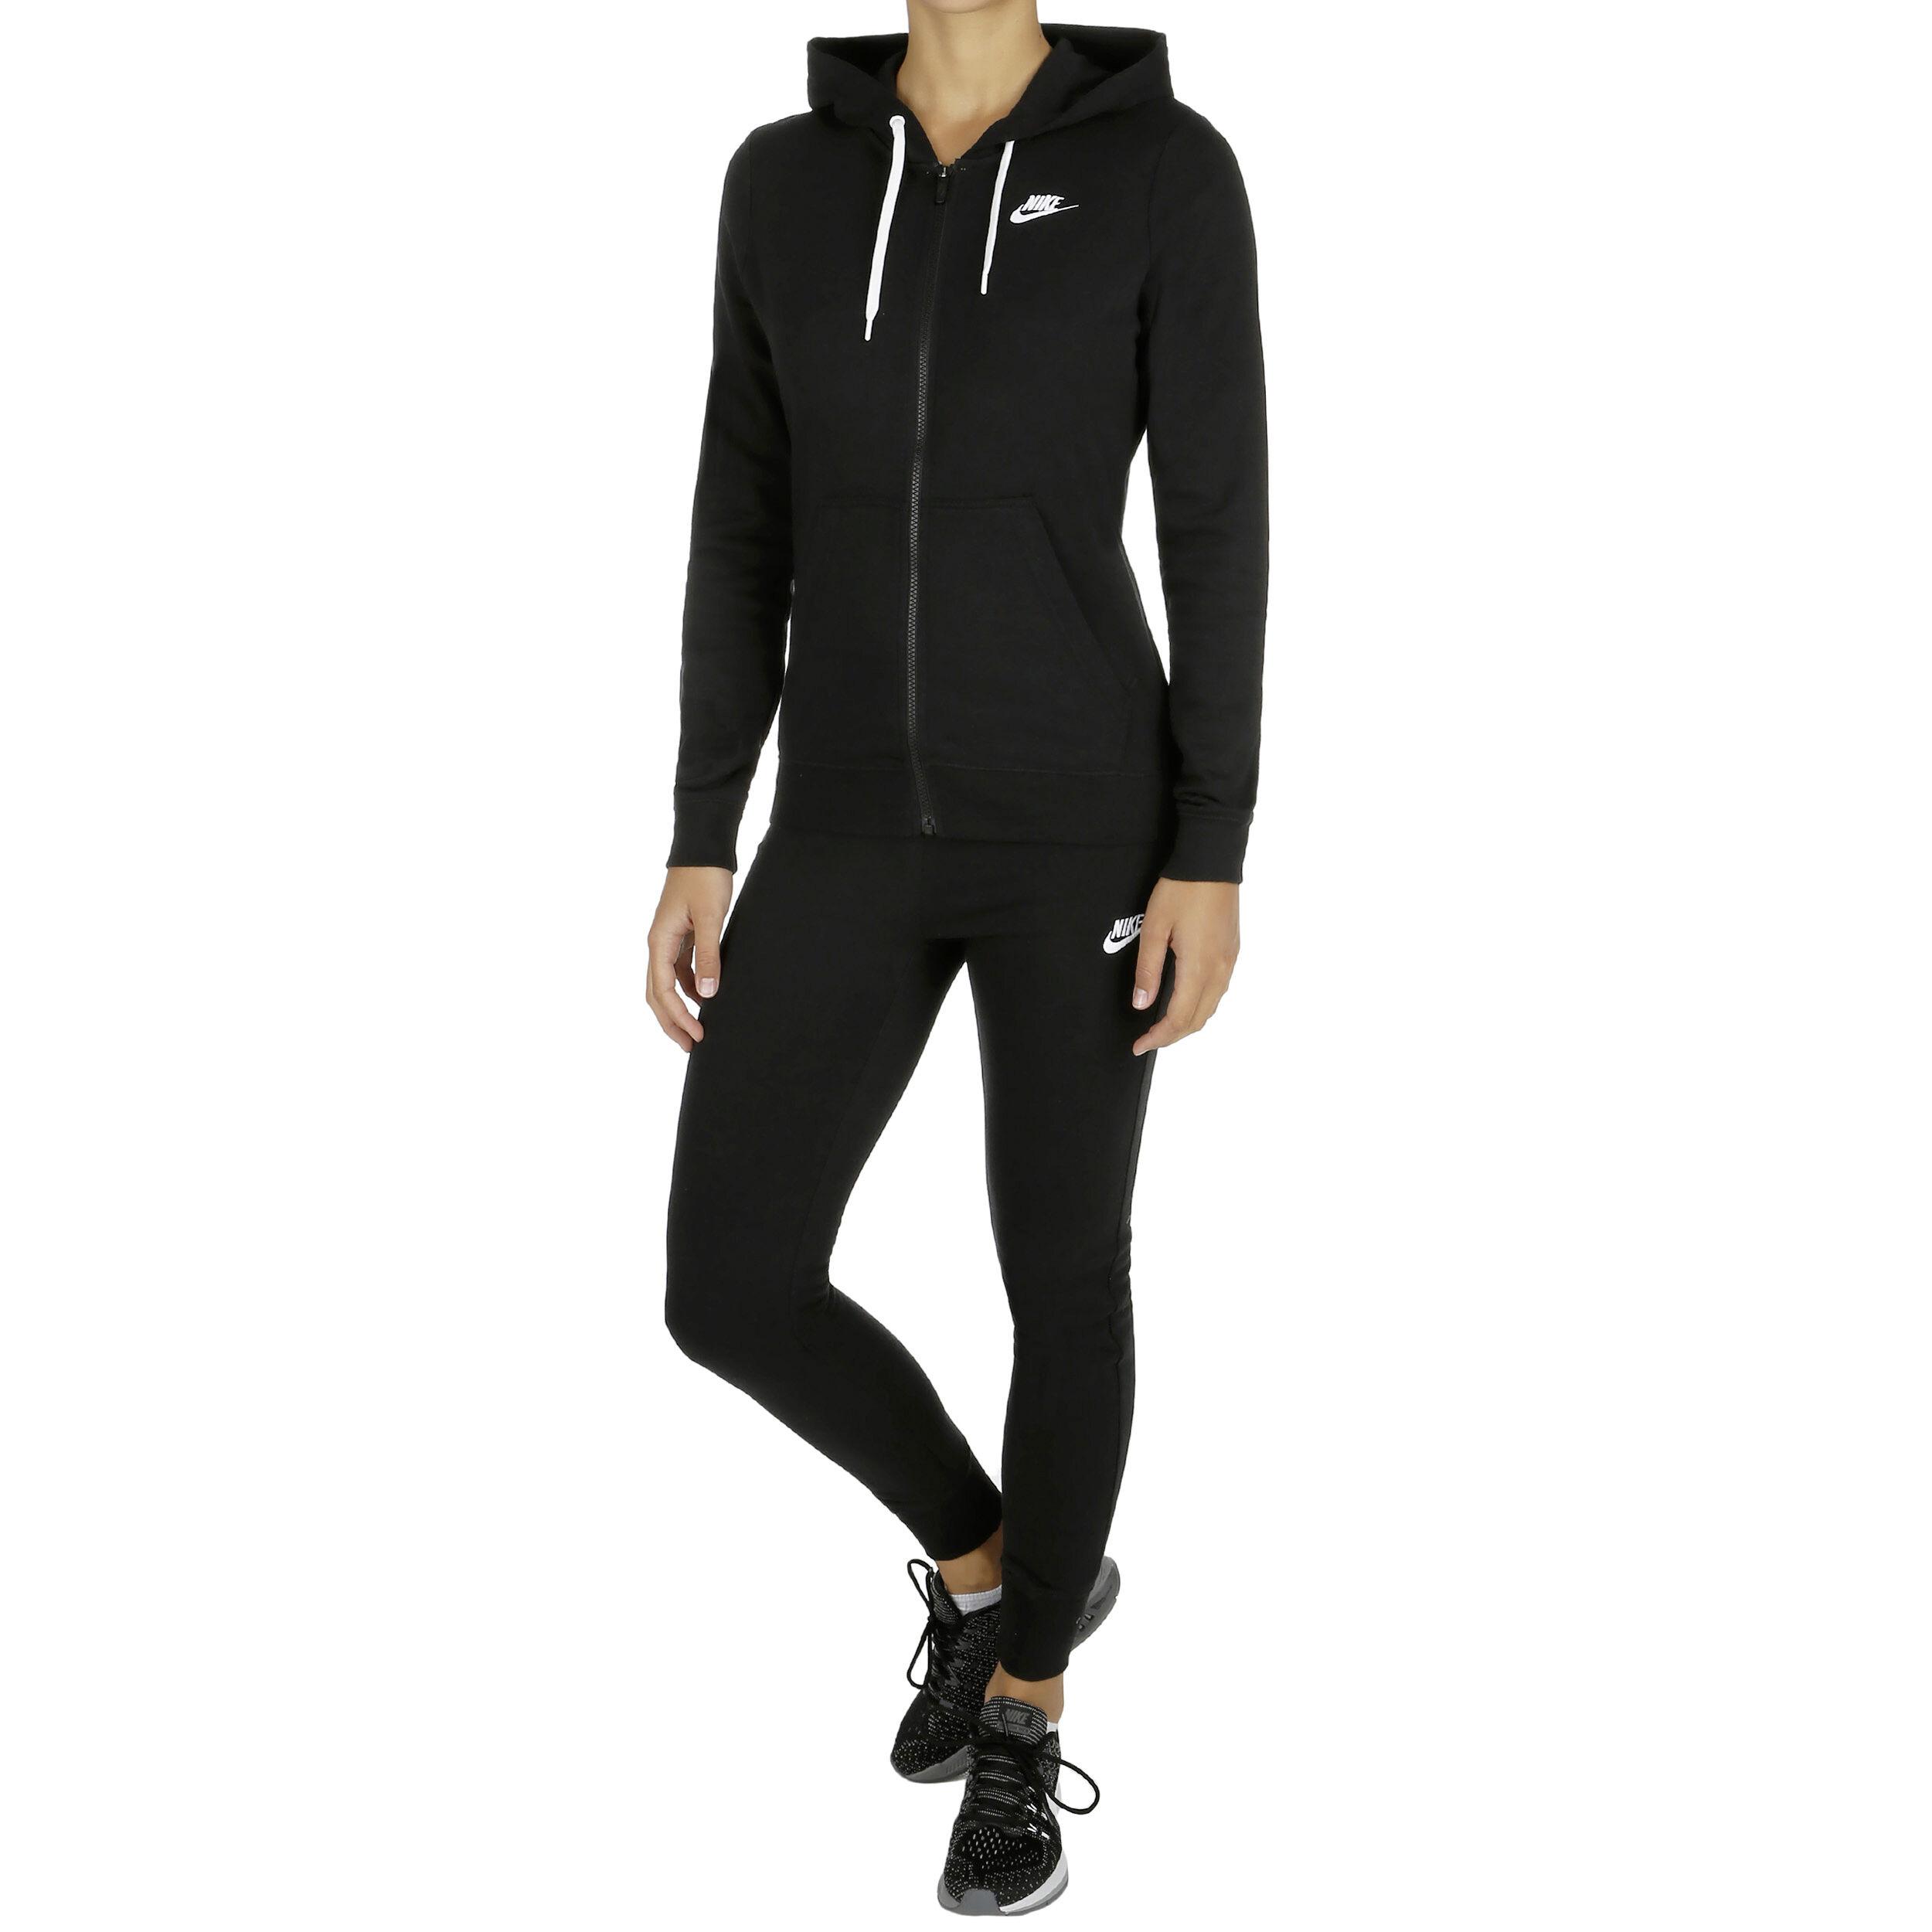 Nike Sportswear Trainingsanzug Damen - Schwarz, Weiß online kaufen ...